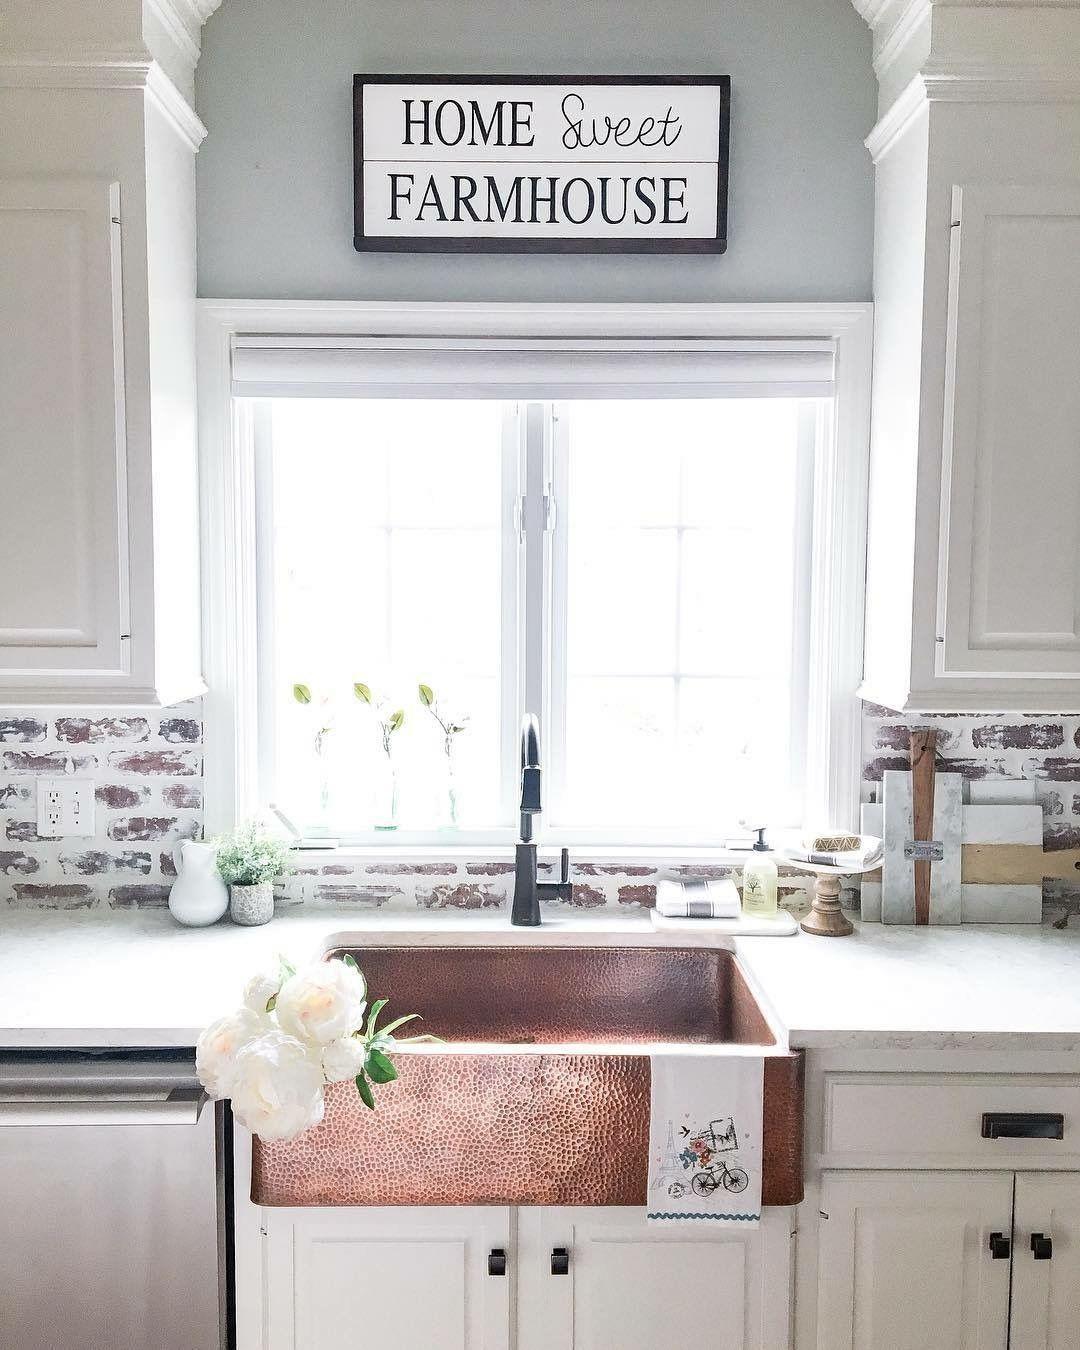 Love This Sink And The White Washed Brick Backsplash Farmhouse Sink Kitchen Rustic Kitchen Sinks Rustic Farmhouse Kitchen